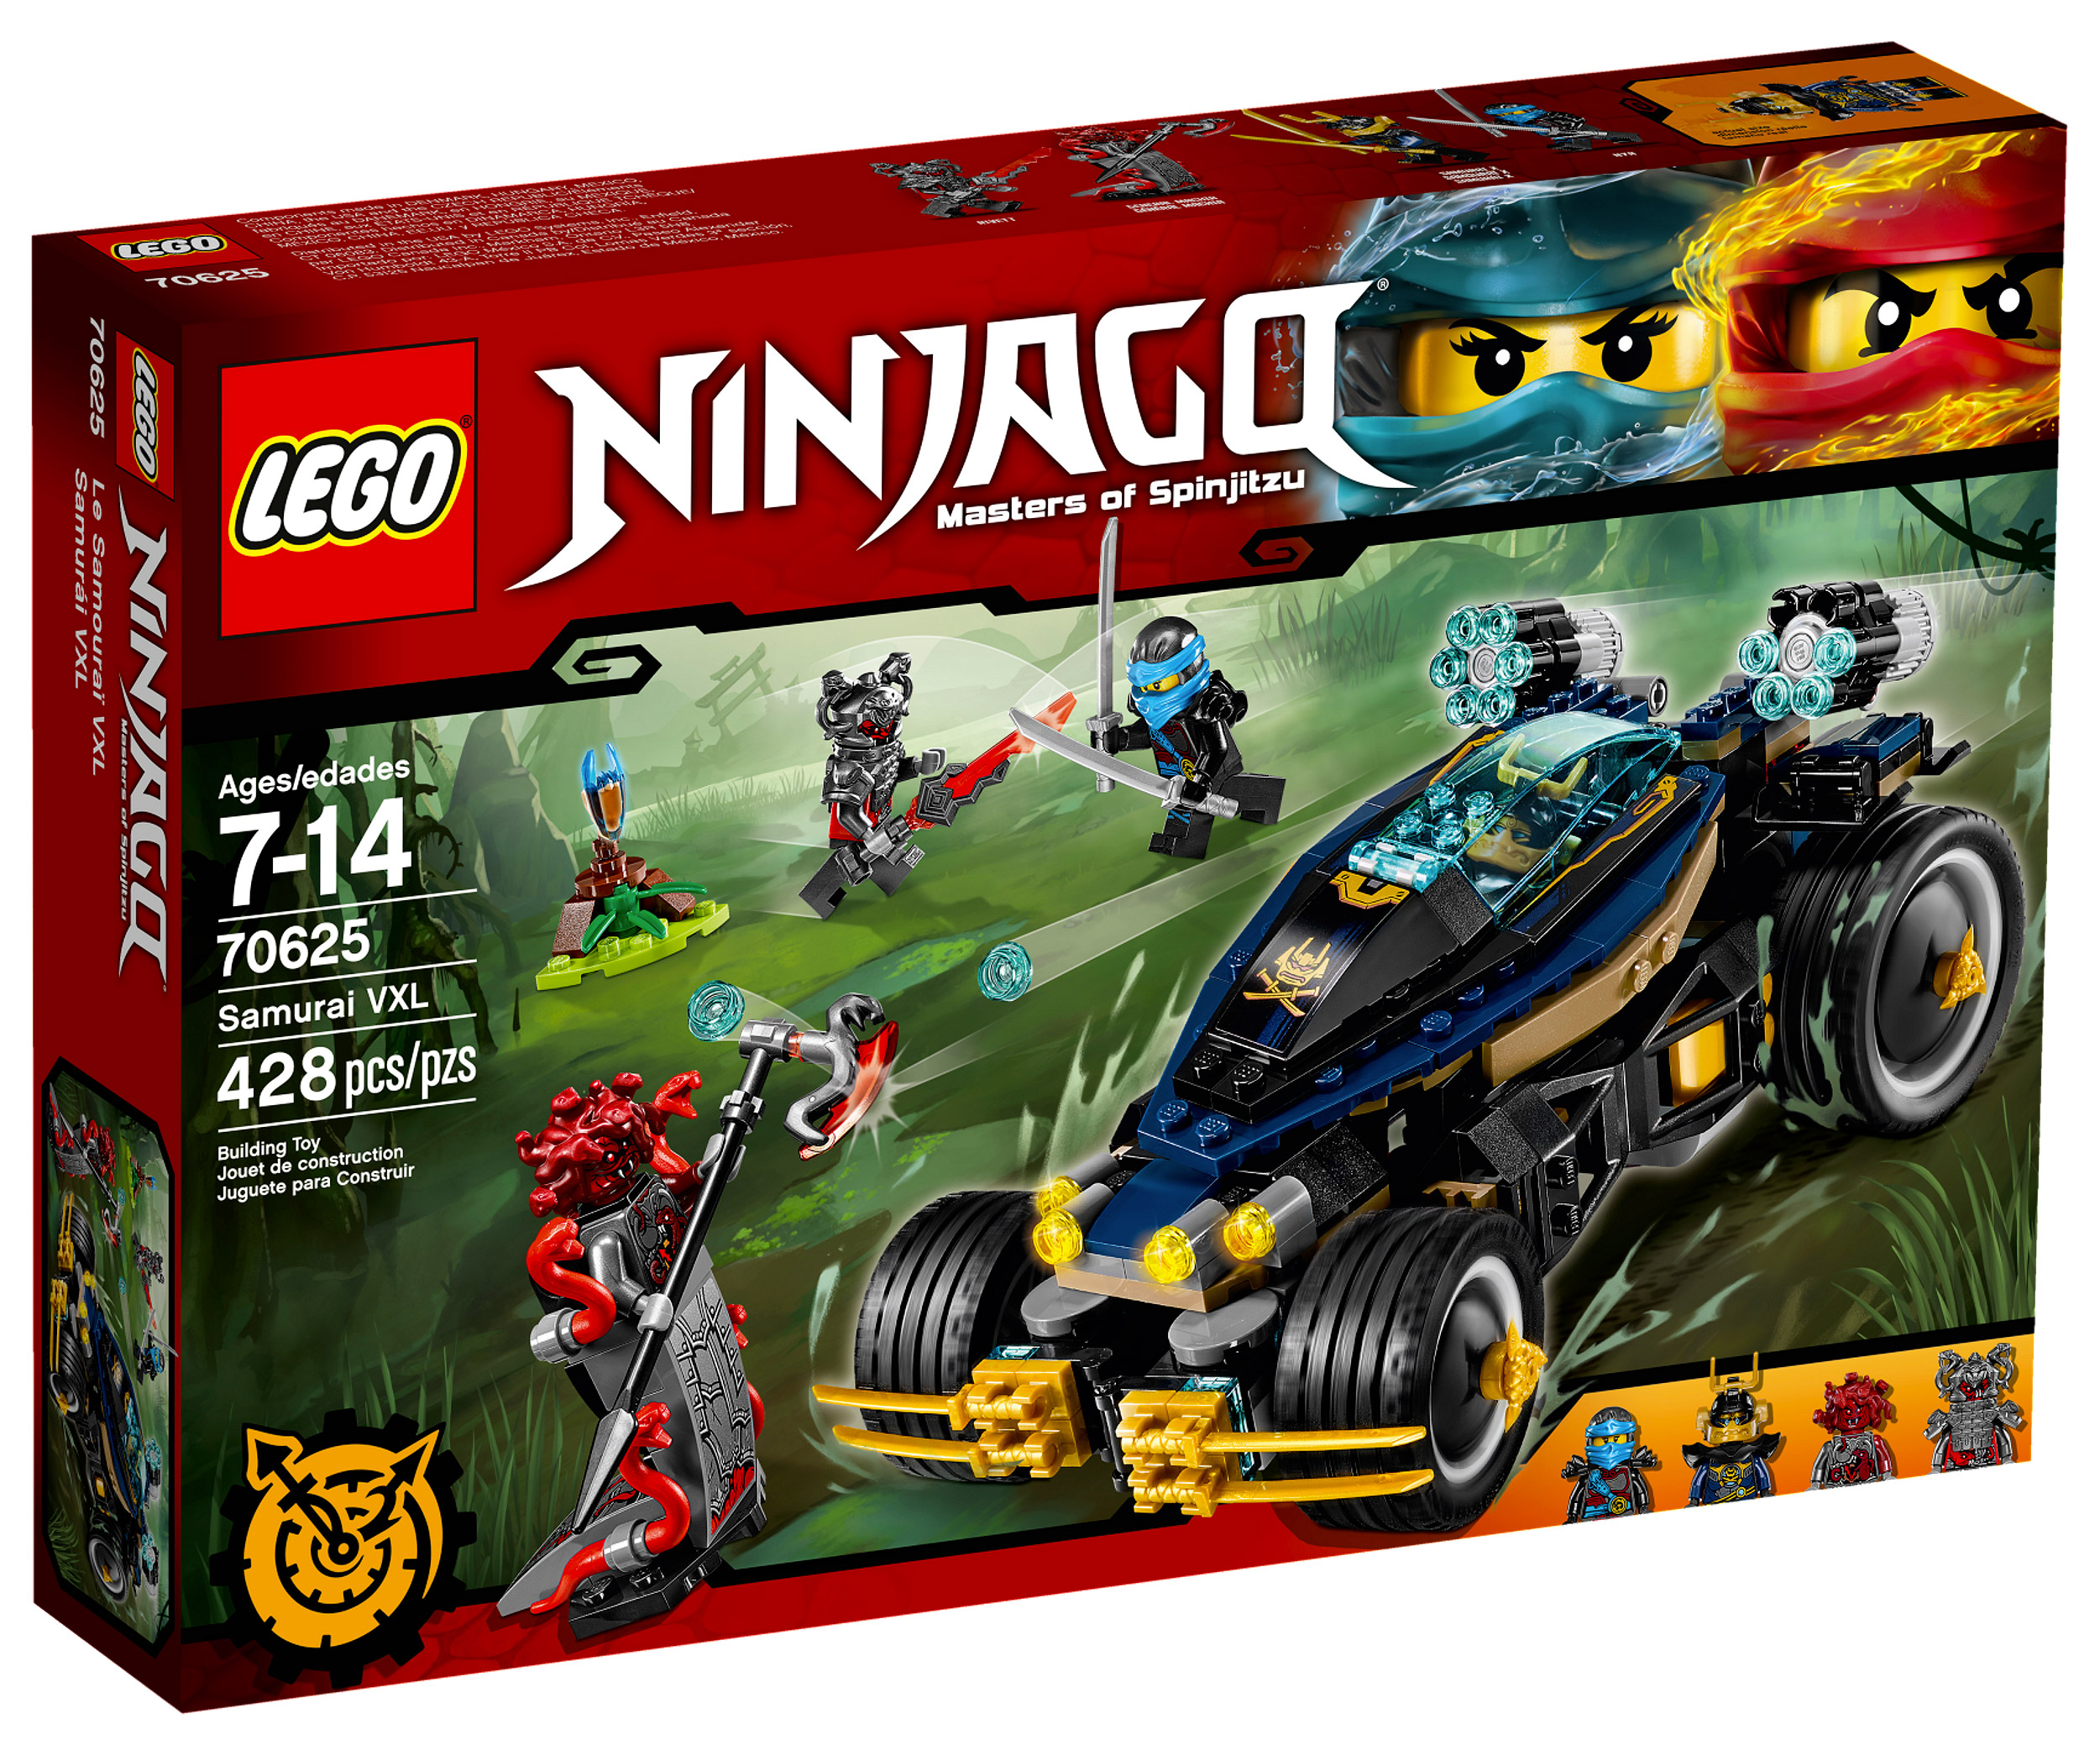 Lego ninjago 70625 pas cher le samoura vxl - Photo lego ninjago ...